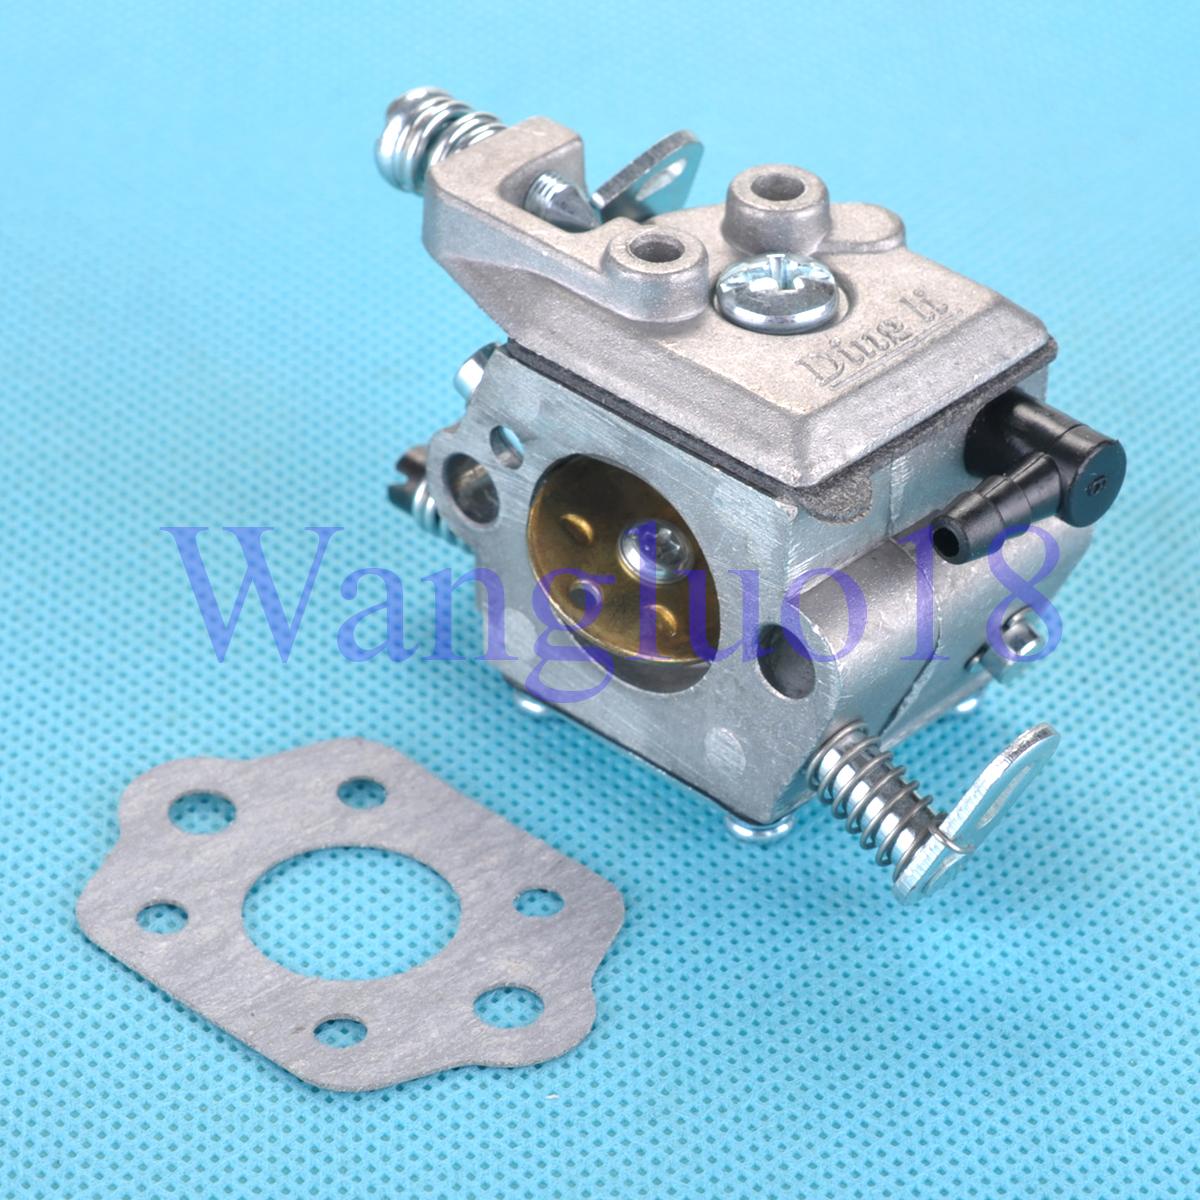 carburetor for stihl 017 018 ms170 ms 170 ms180 chainsaw carb 1130 120 0608 ebay. Black Bedroom Furniture Sets. Home Design Ideas